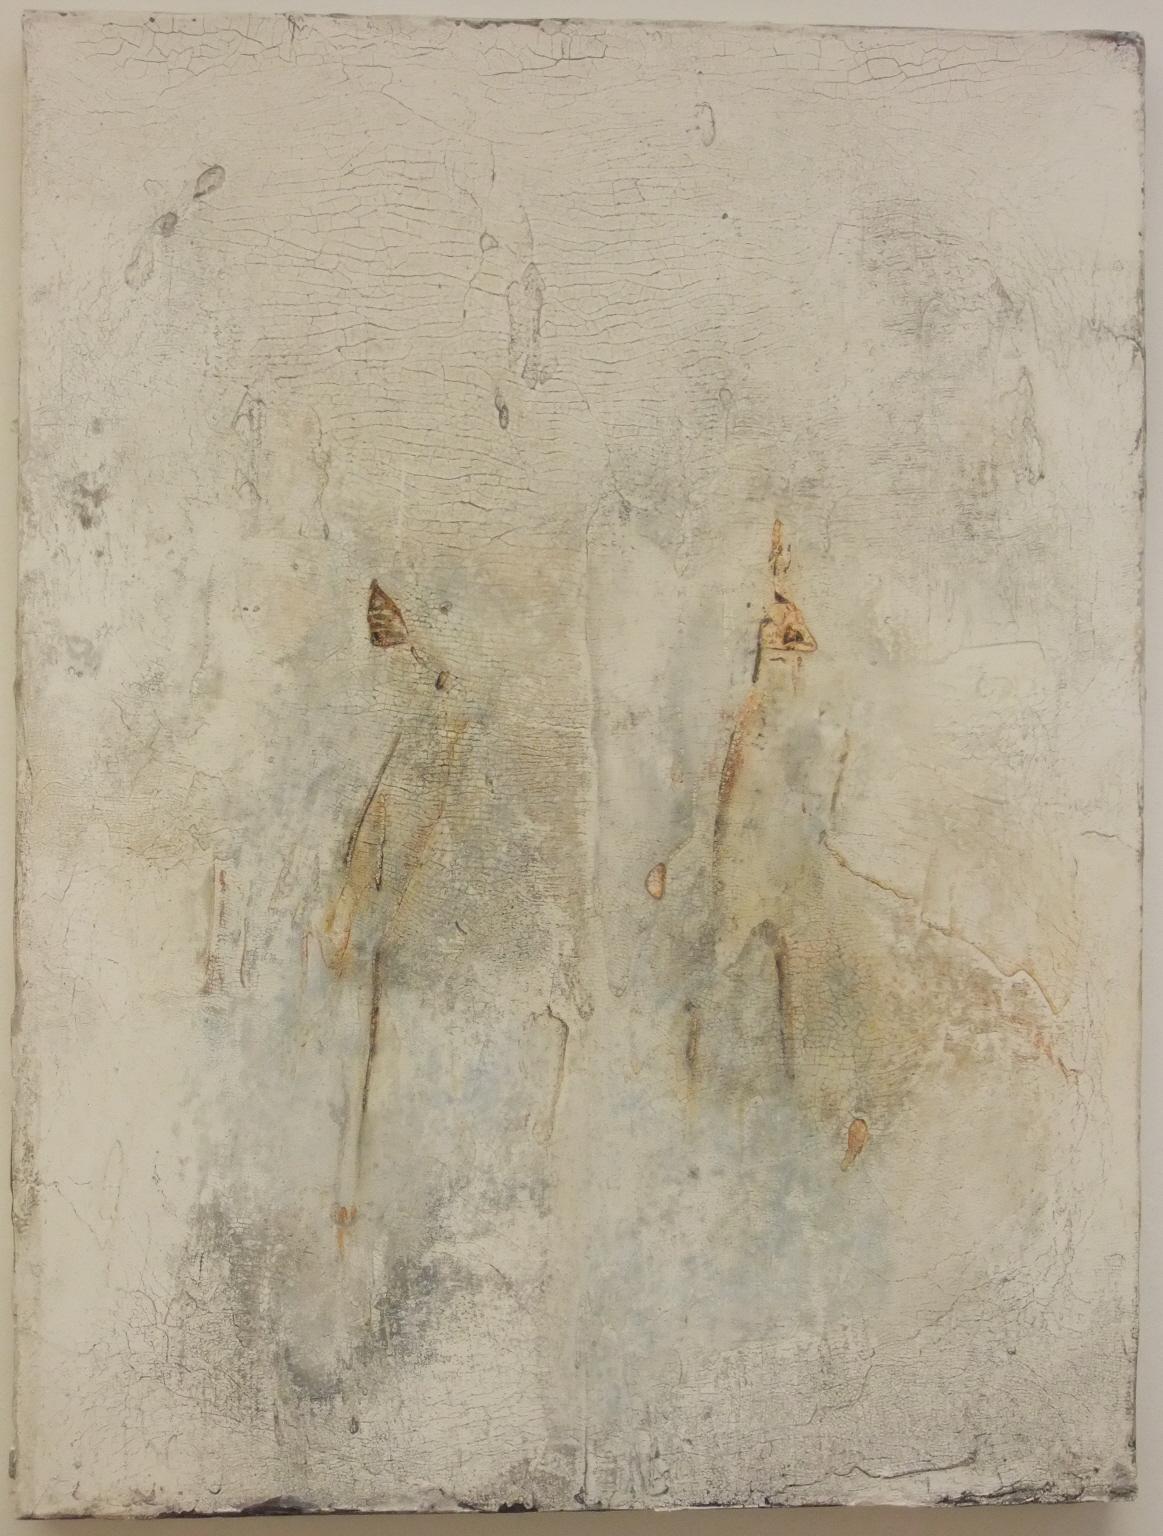 Werknr. SK_110 |O. T. | Intonaco, Öl, Wachs auf Holz |90 x 120 cm |2013